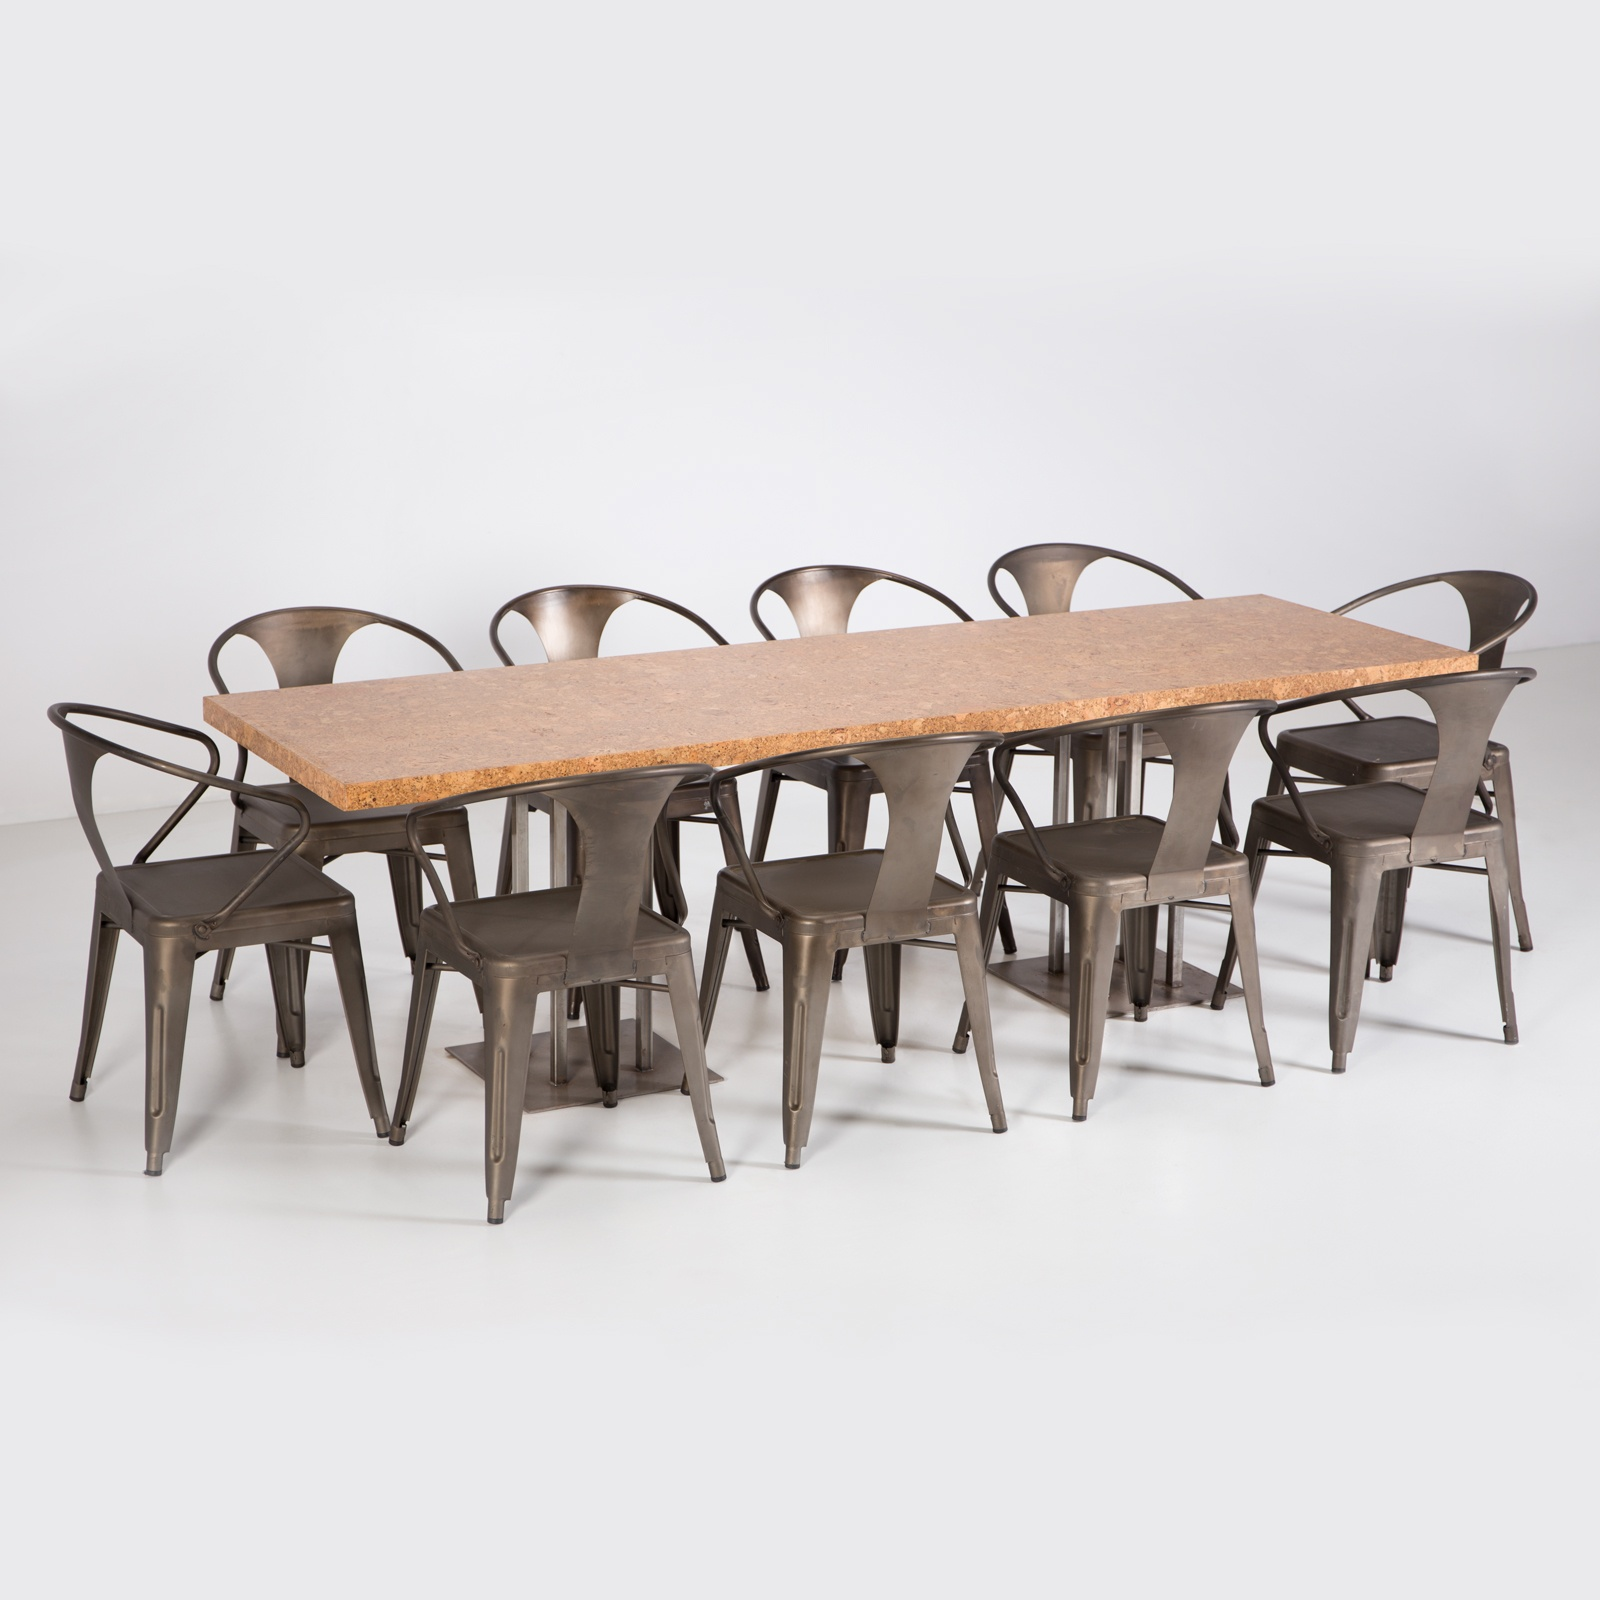 Cork Dining Table 96 Formdecor